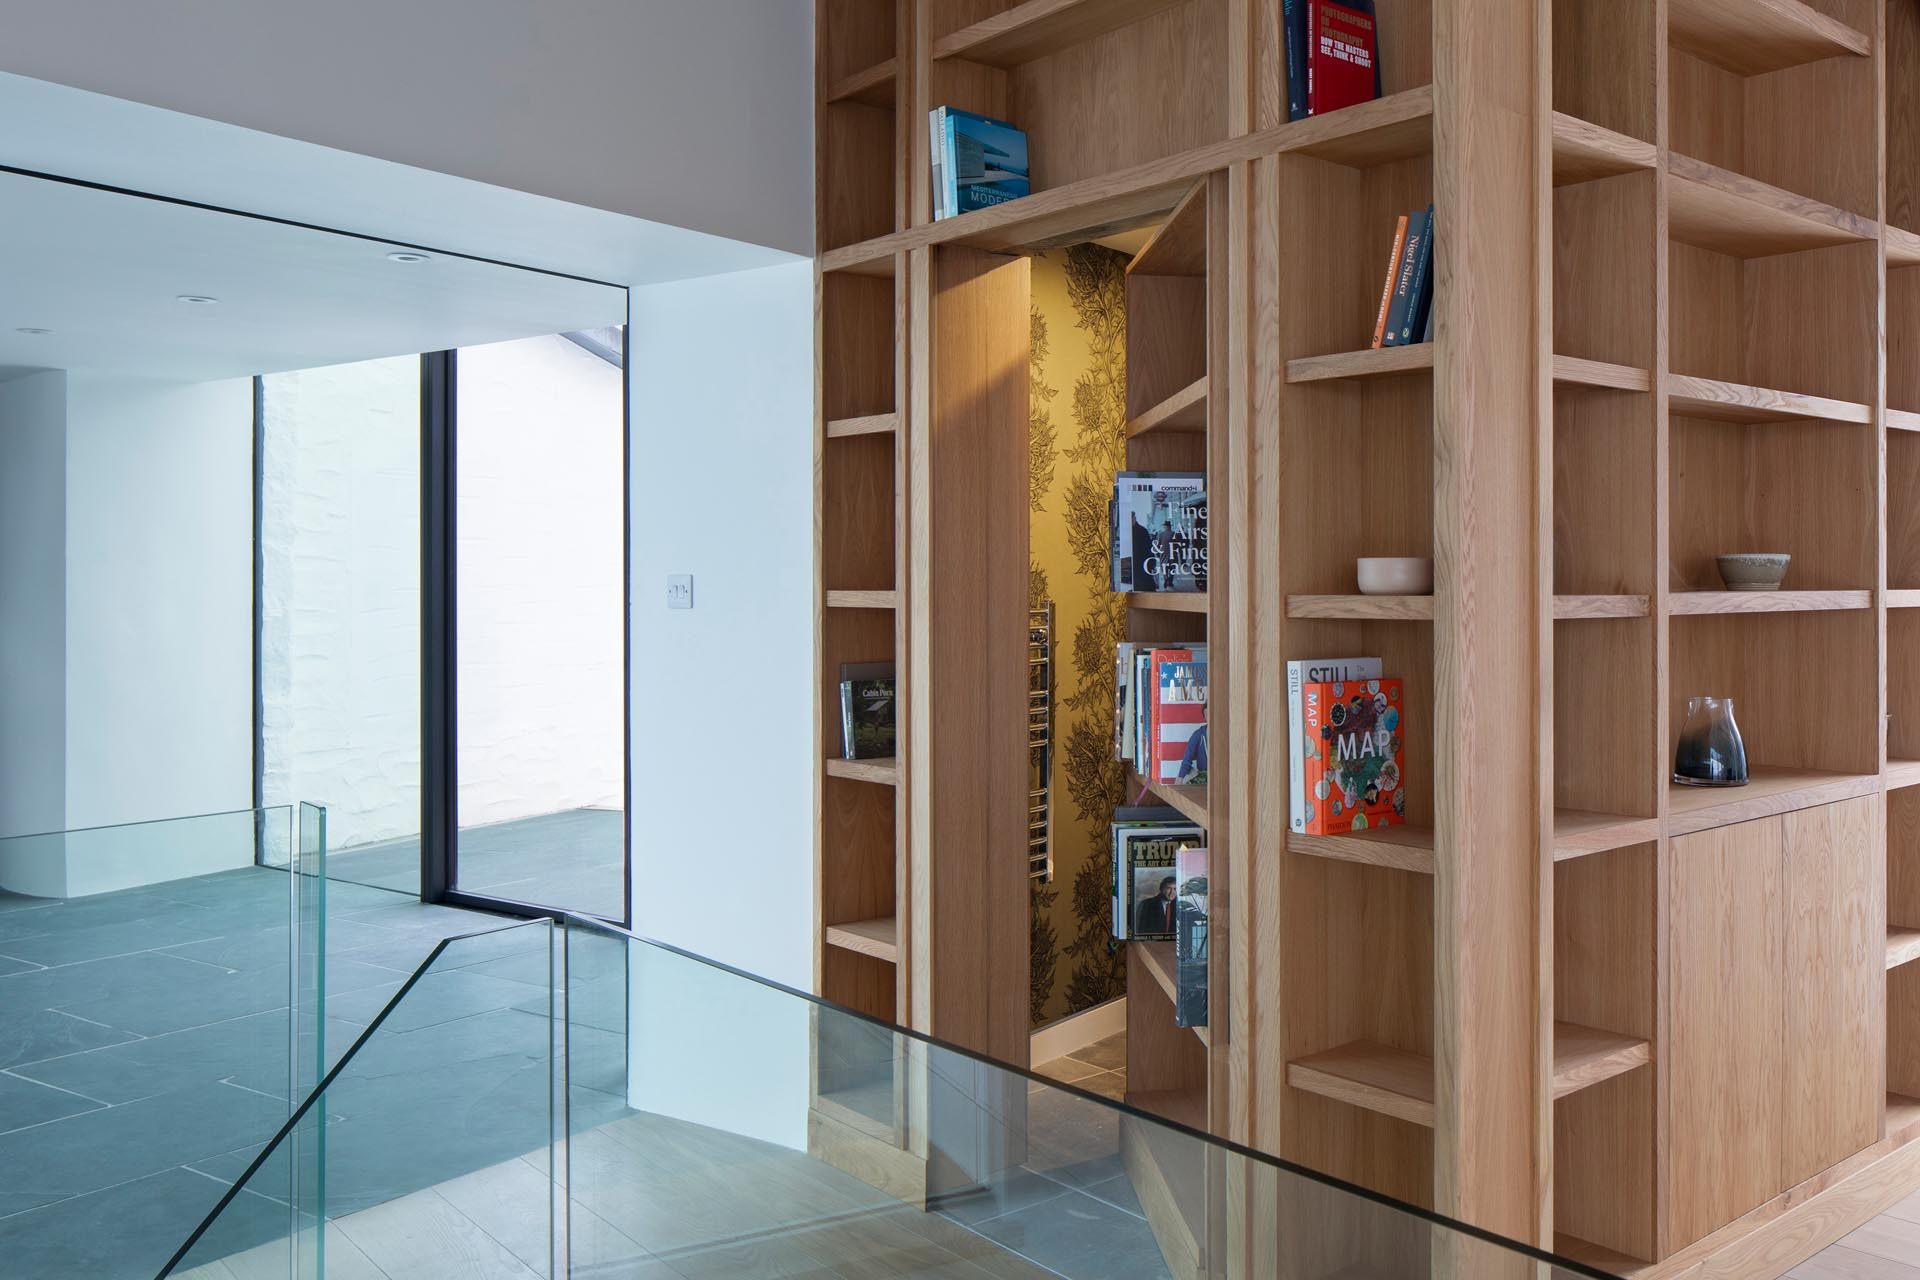 A wood bookshelf hides a powder room.